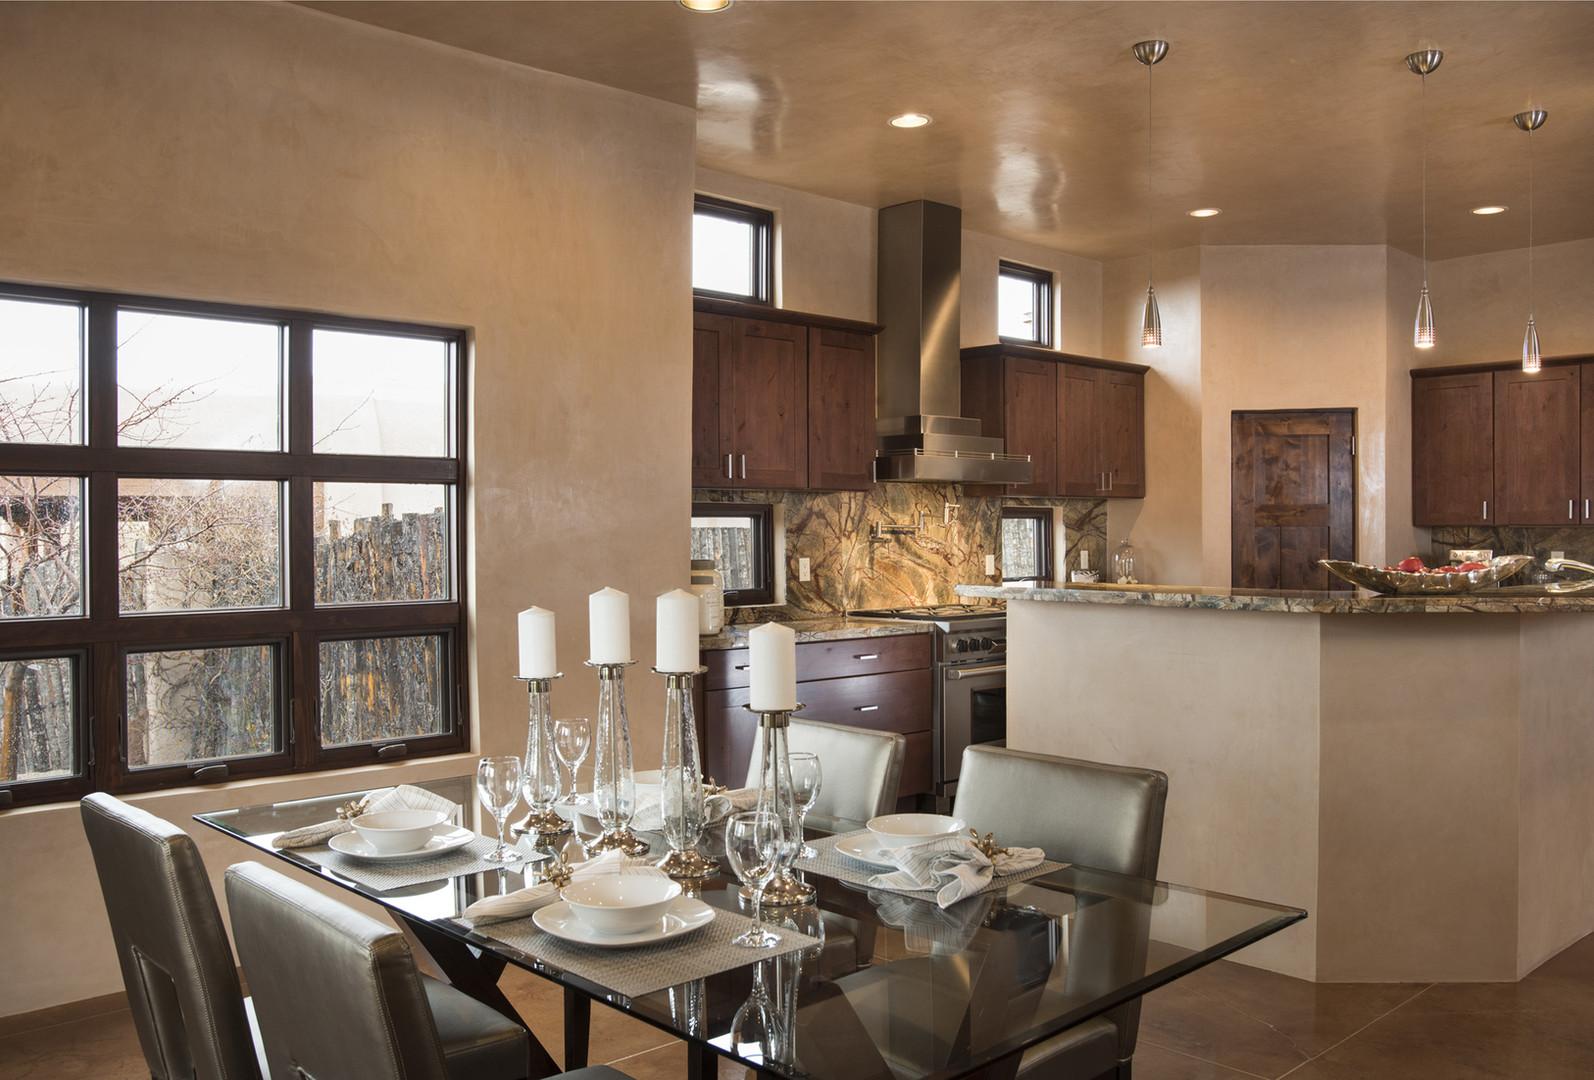 Camino Esperanza   Dining Room to Kitchen View